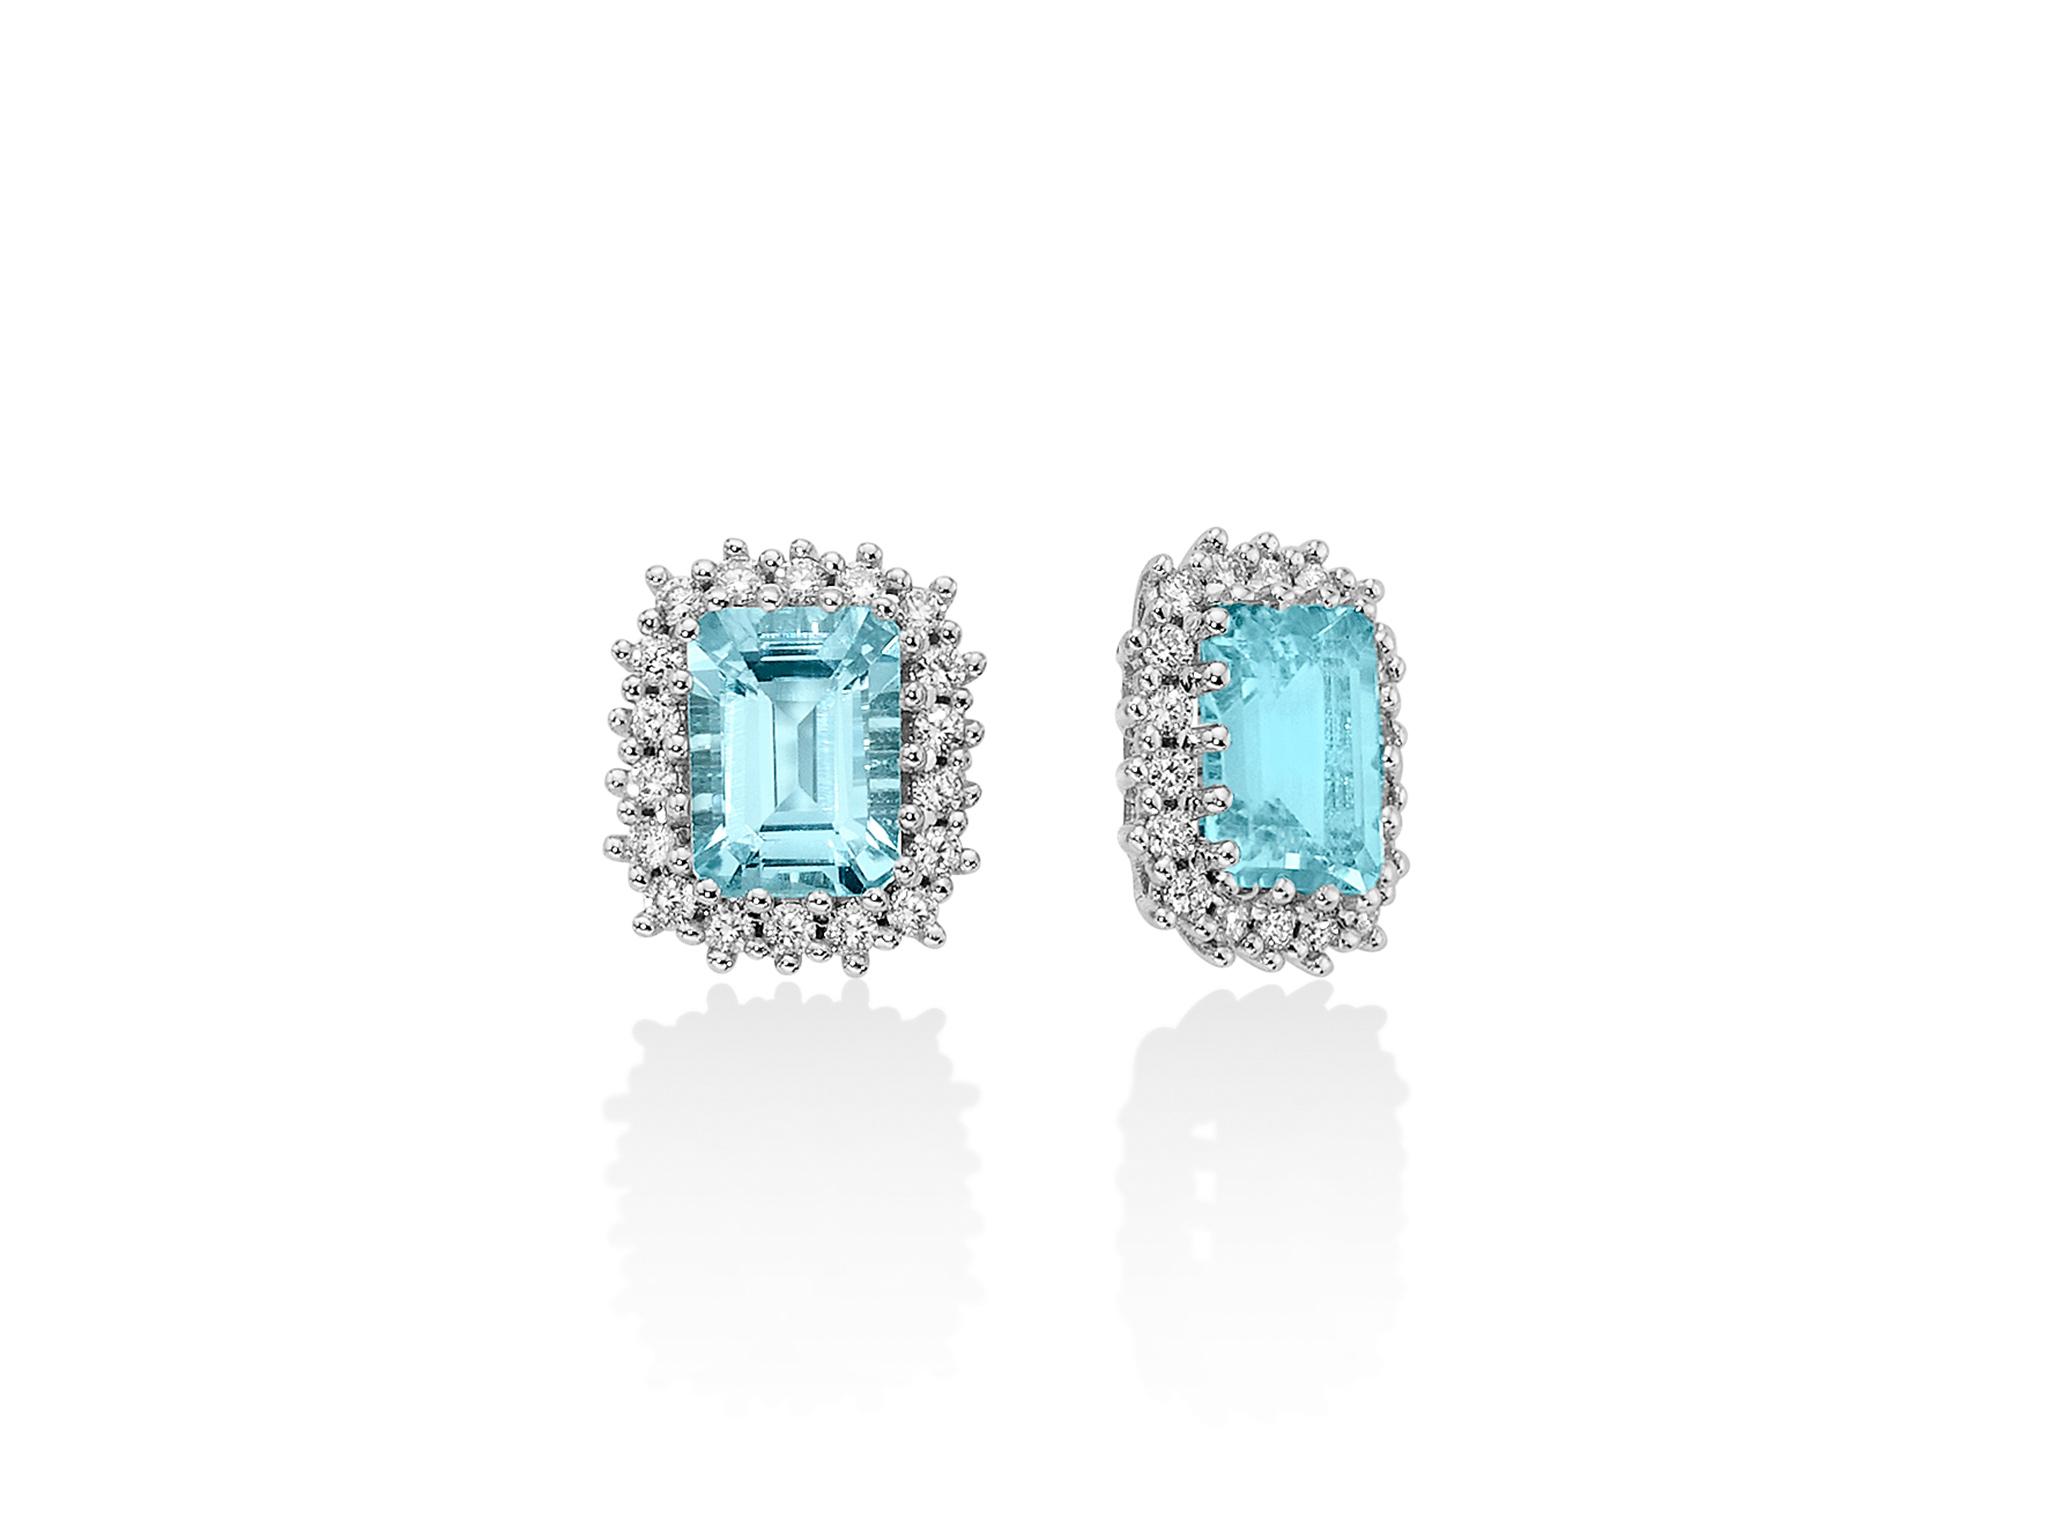 Orecchini oro, diamanti e Acquamarina - ERD2270